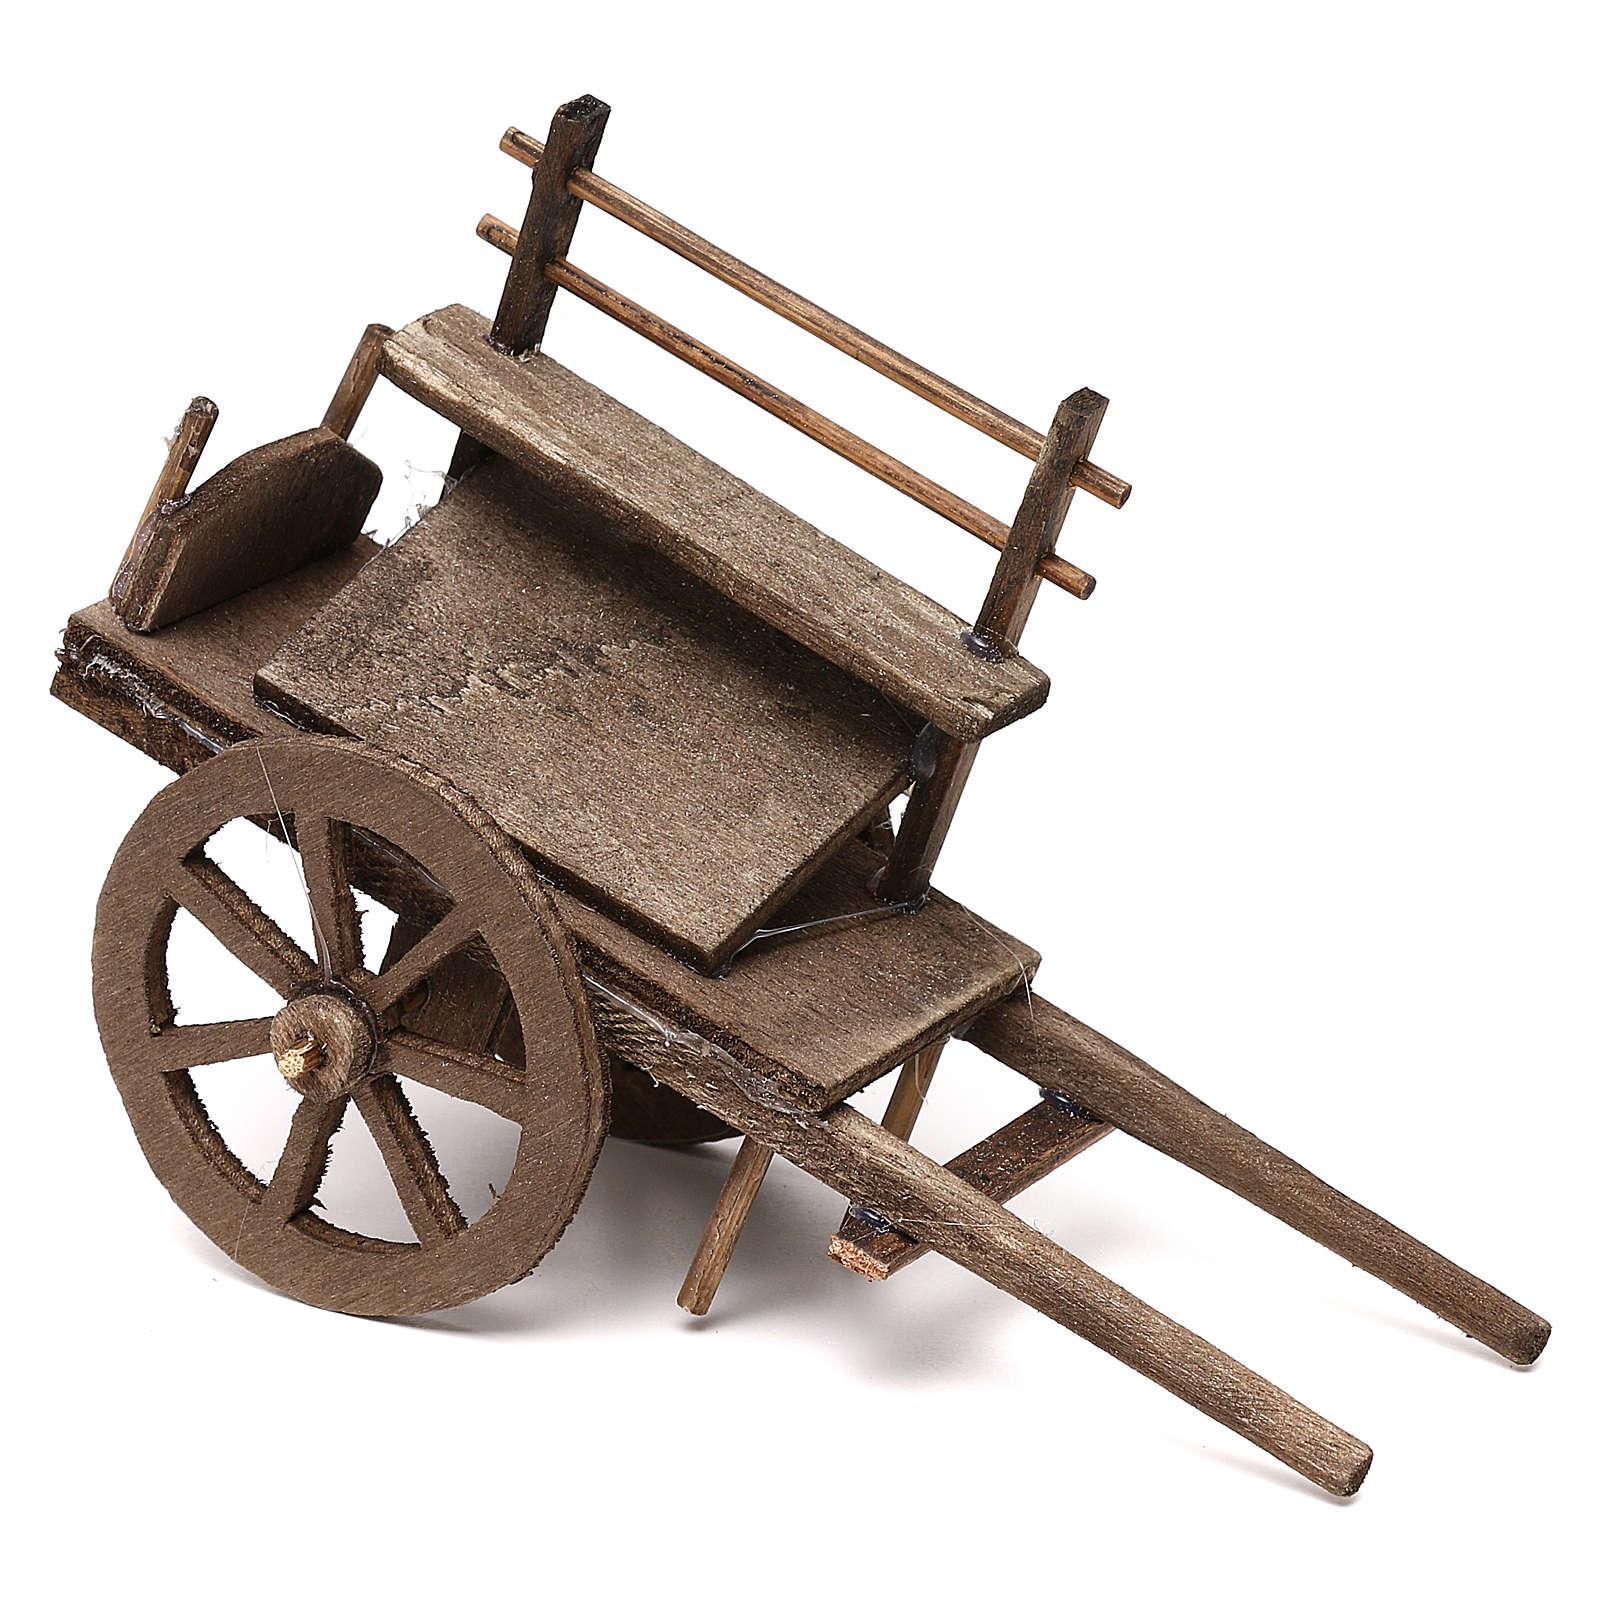 Carro del vendedor de madera belén napolitano 12 cm 4